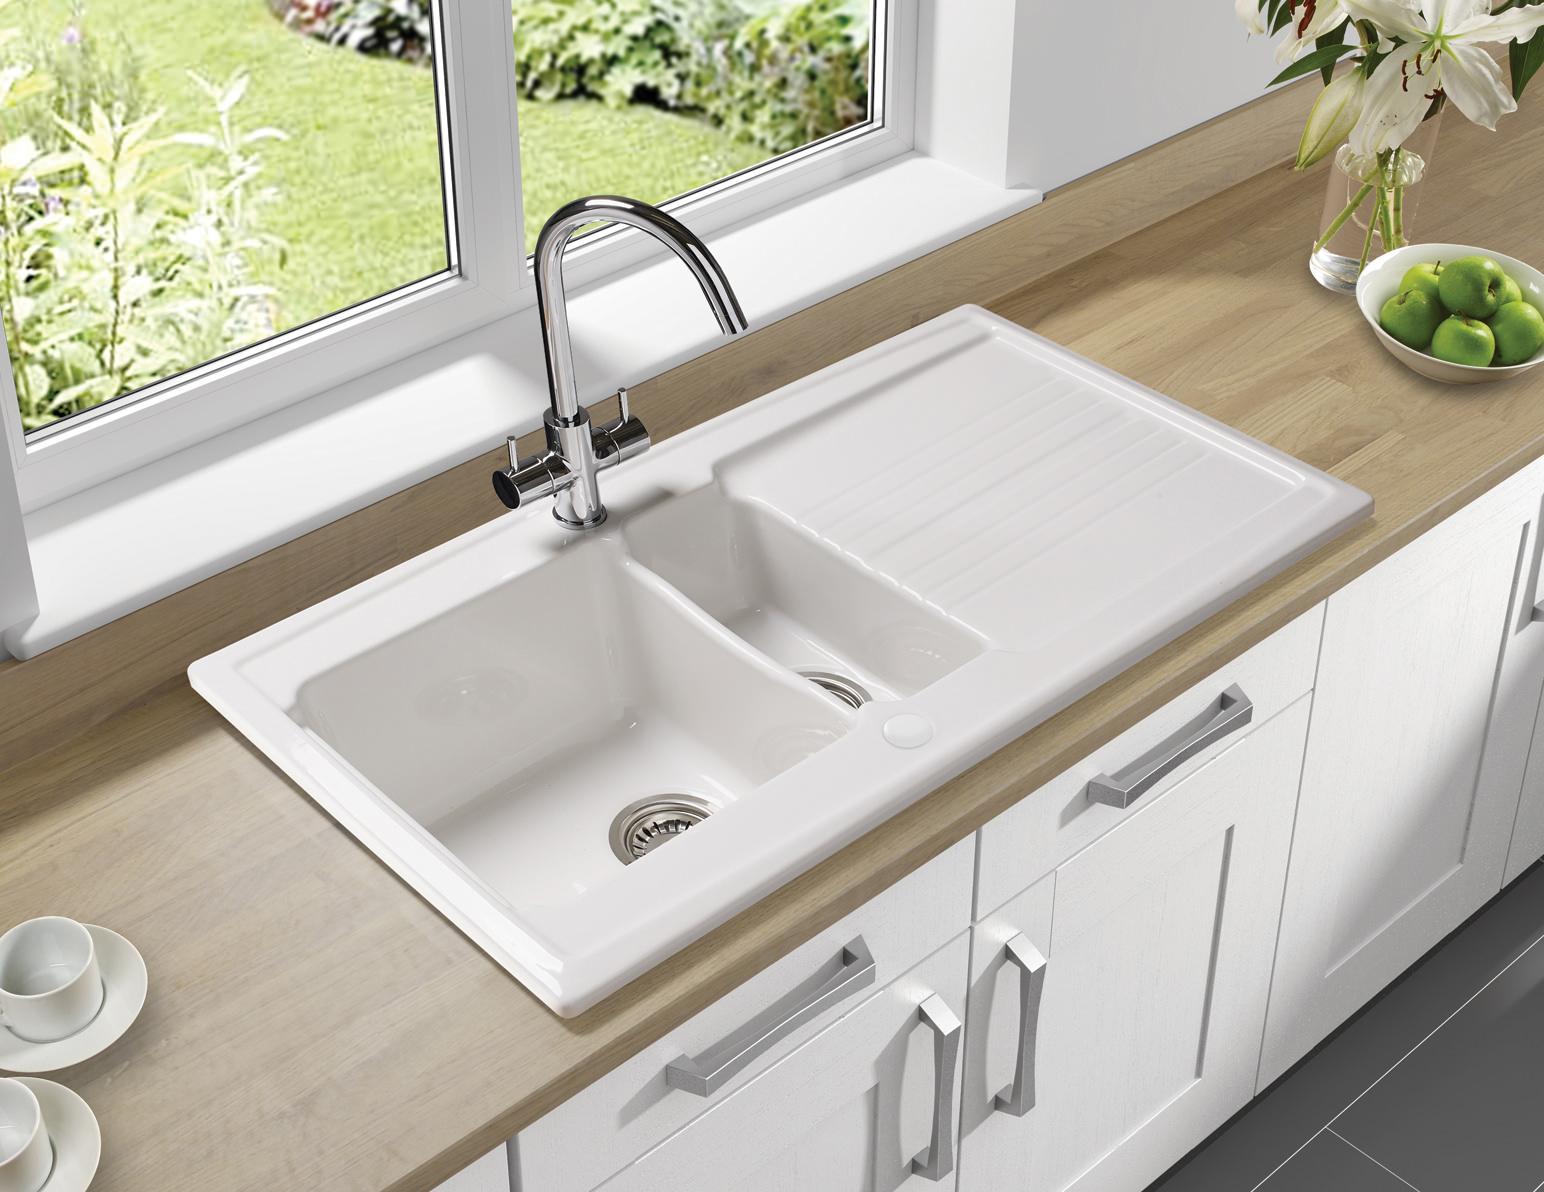 Astracast Equinox White Ceramic Inset Sink - 1.5 Bowl